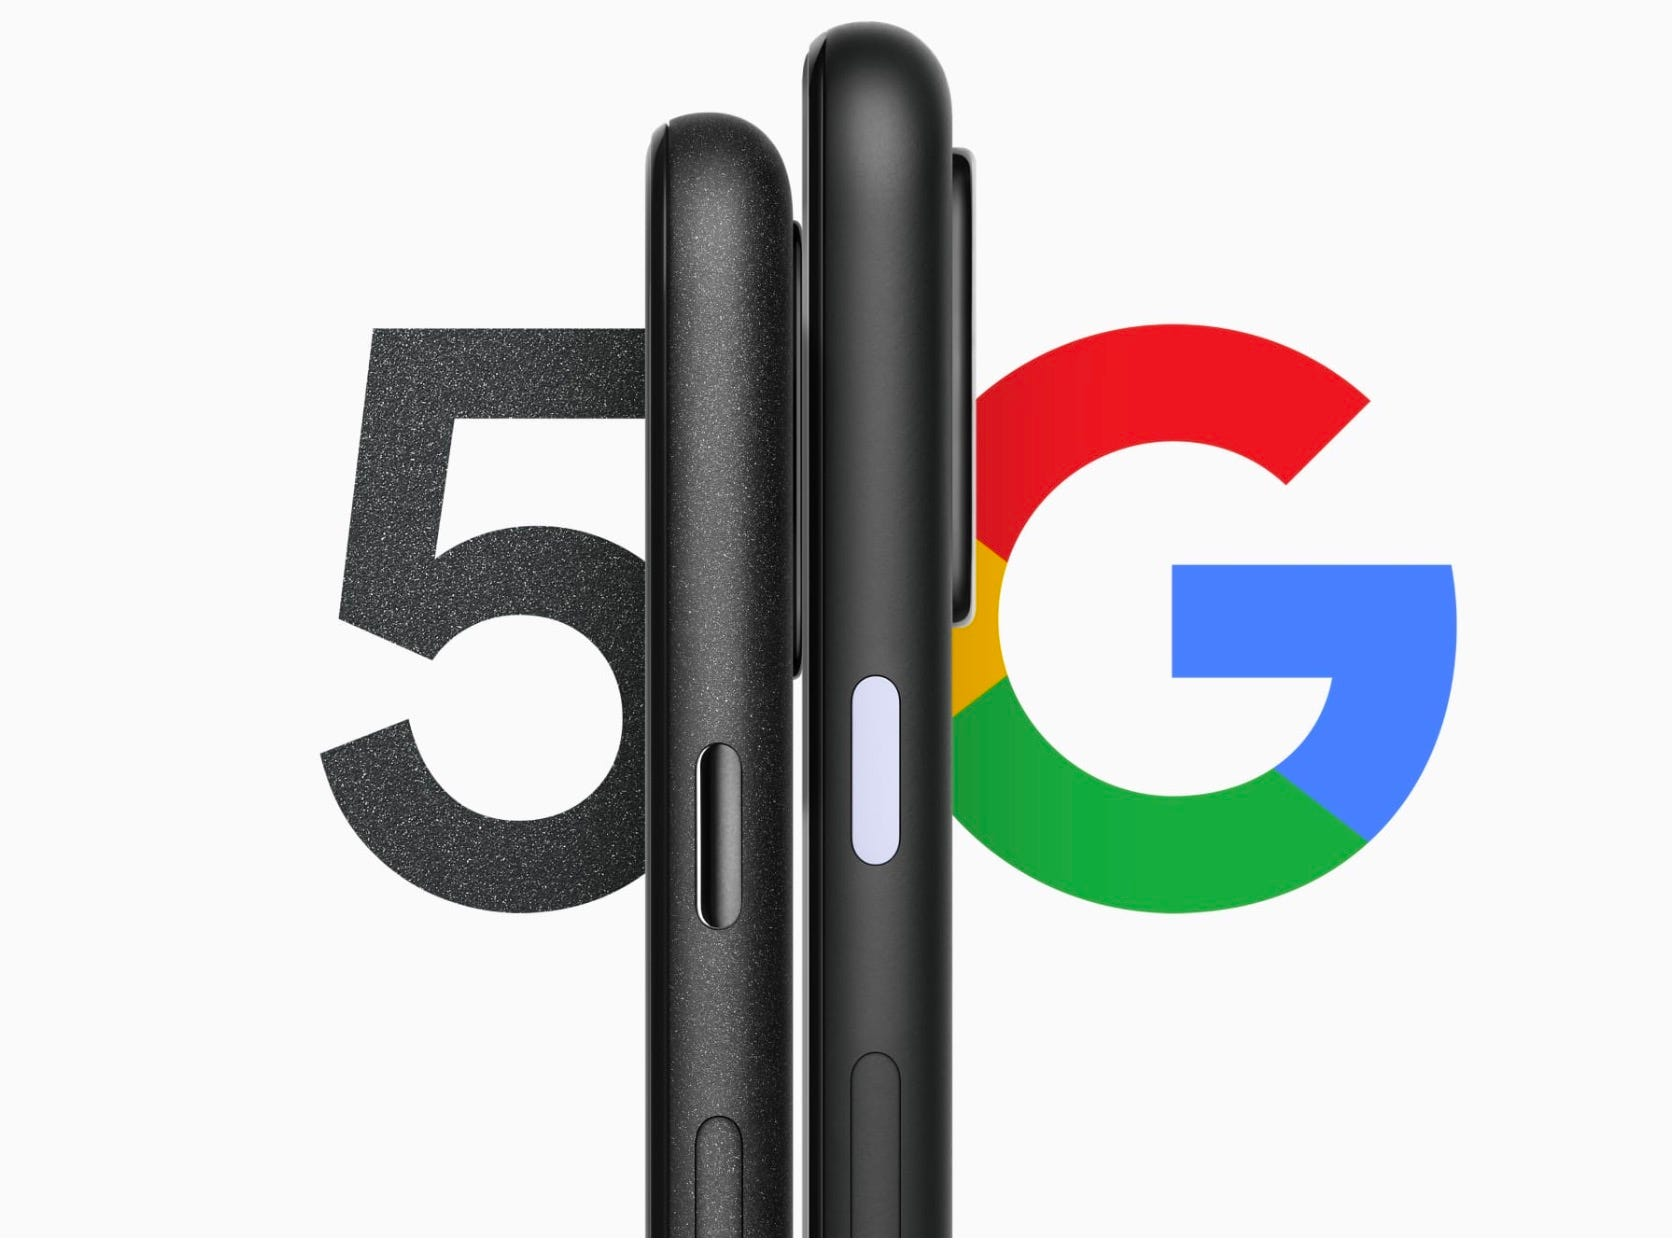 Google introduces new phones, Google TV, smart speaker and Chromecast